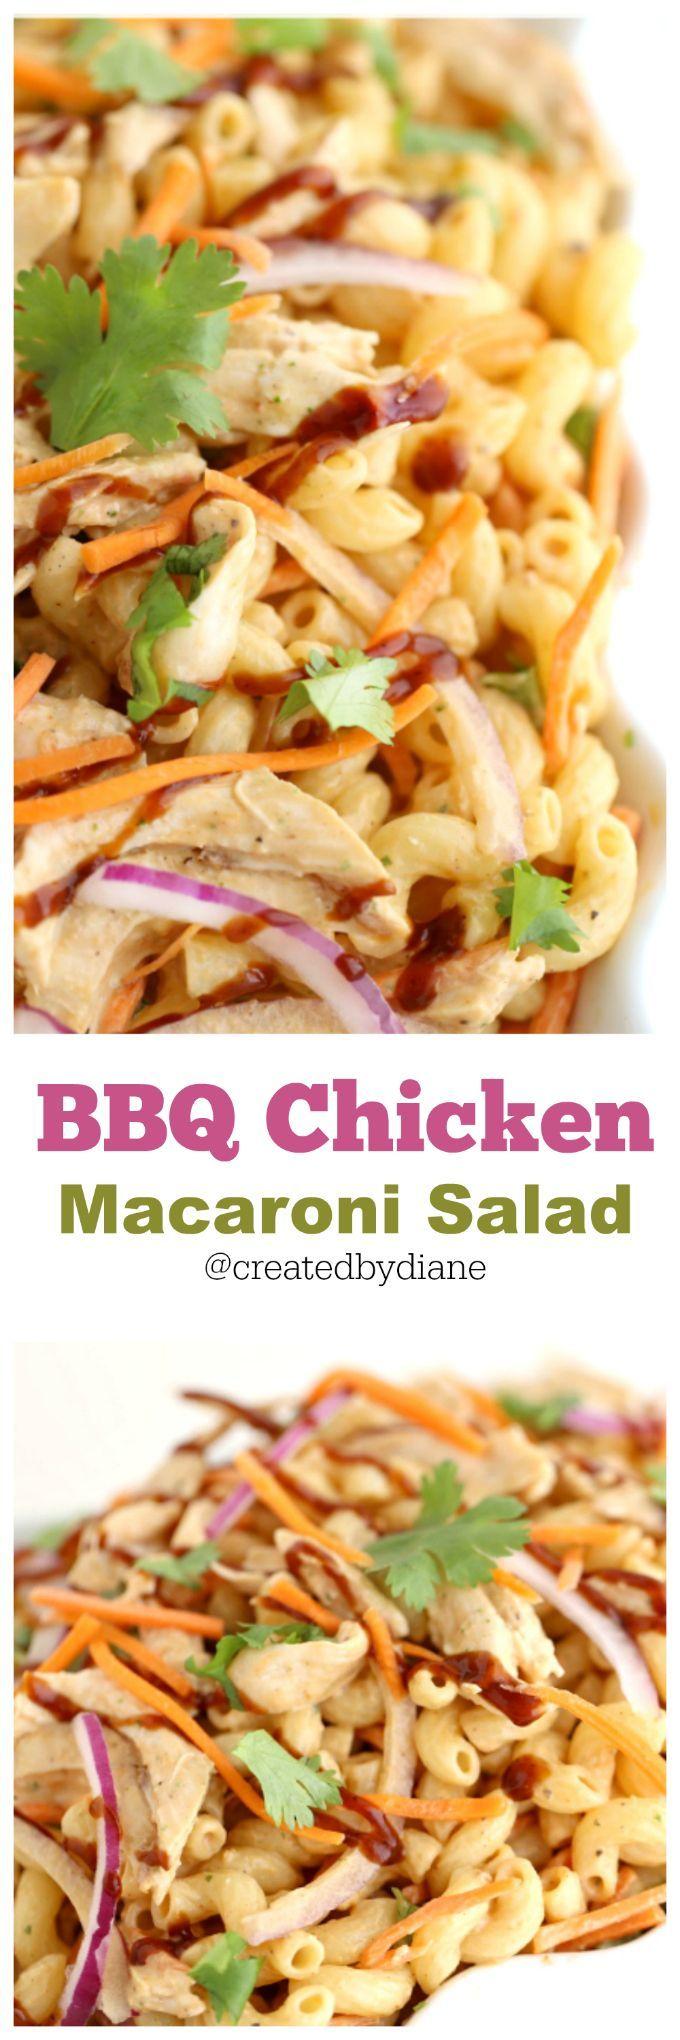 bbq chicken macaroni salad from /createdbydiane/